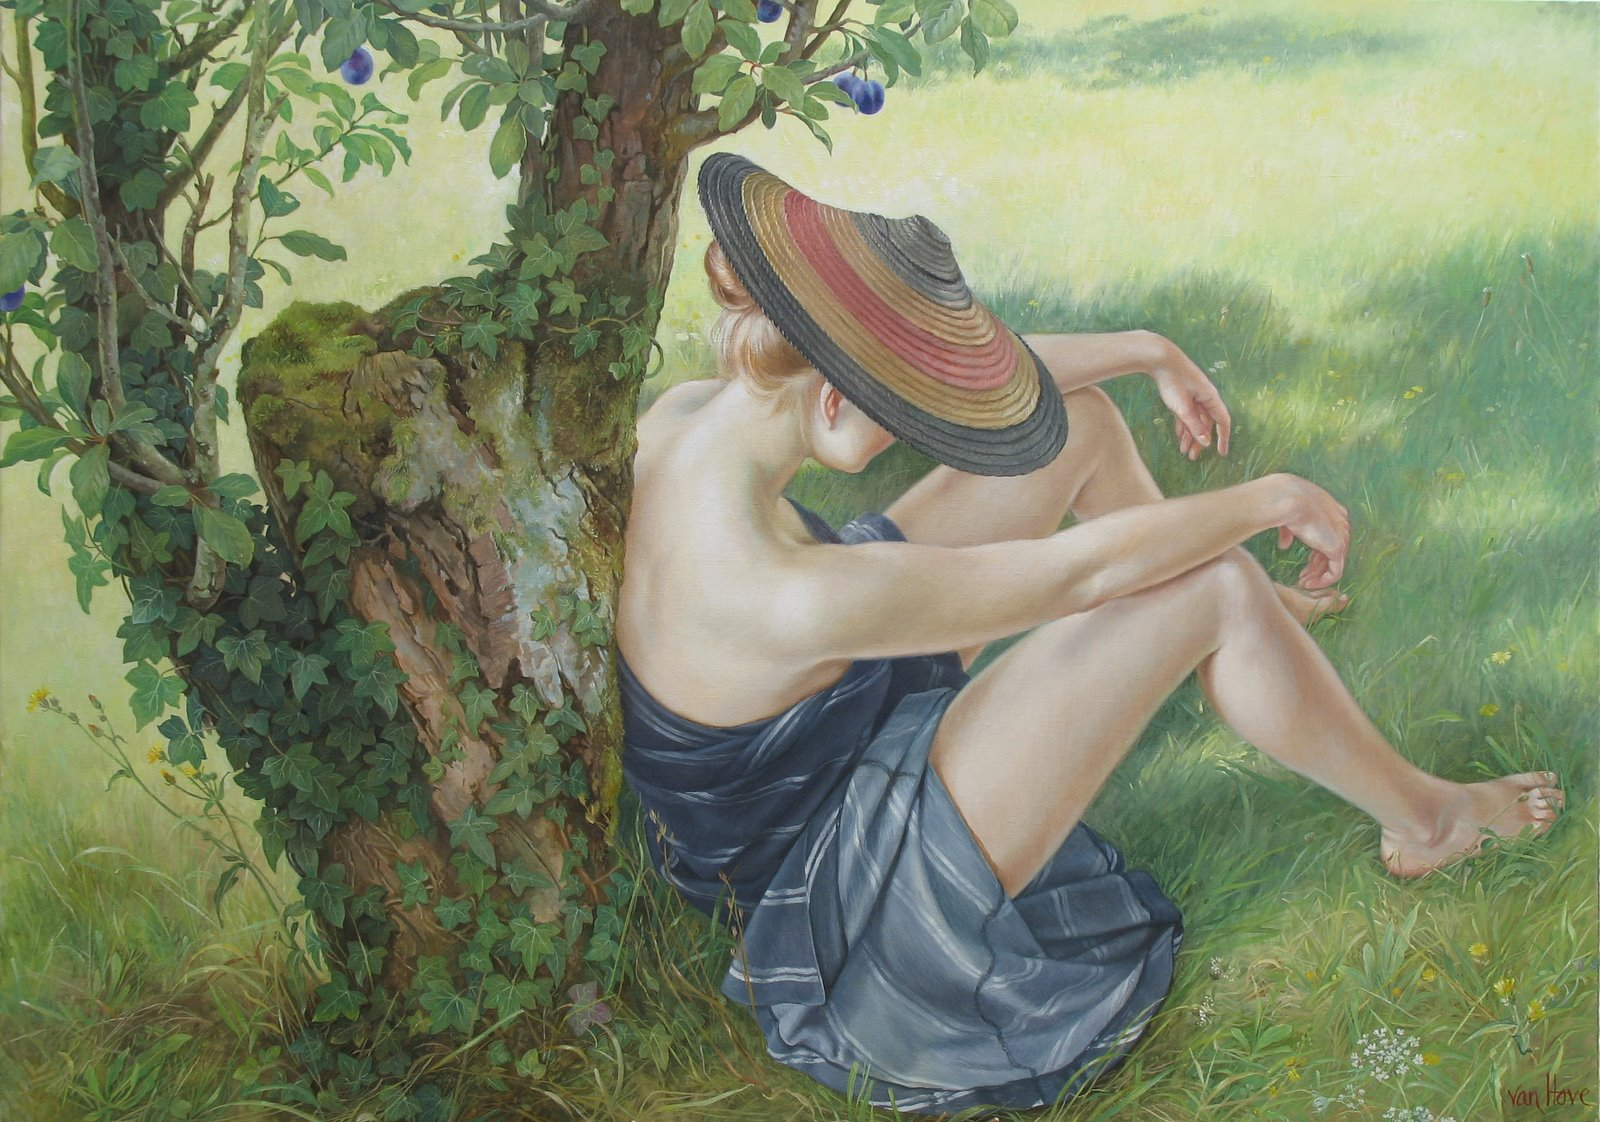 obraz namalowany przez francine van hove